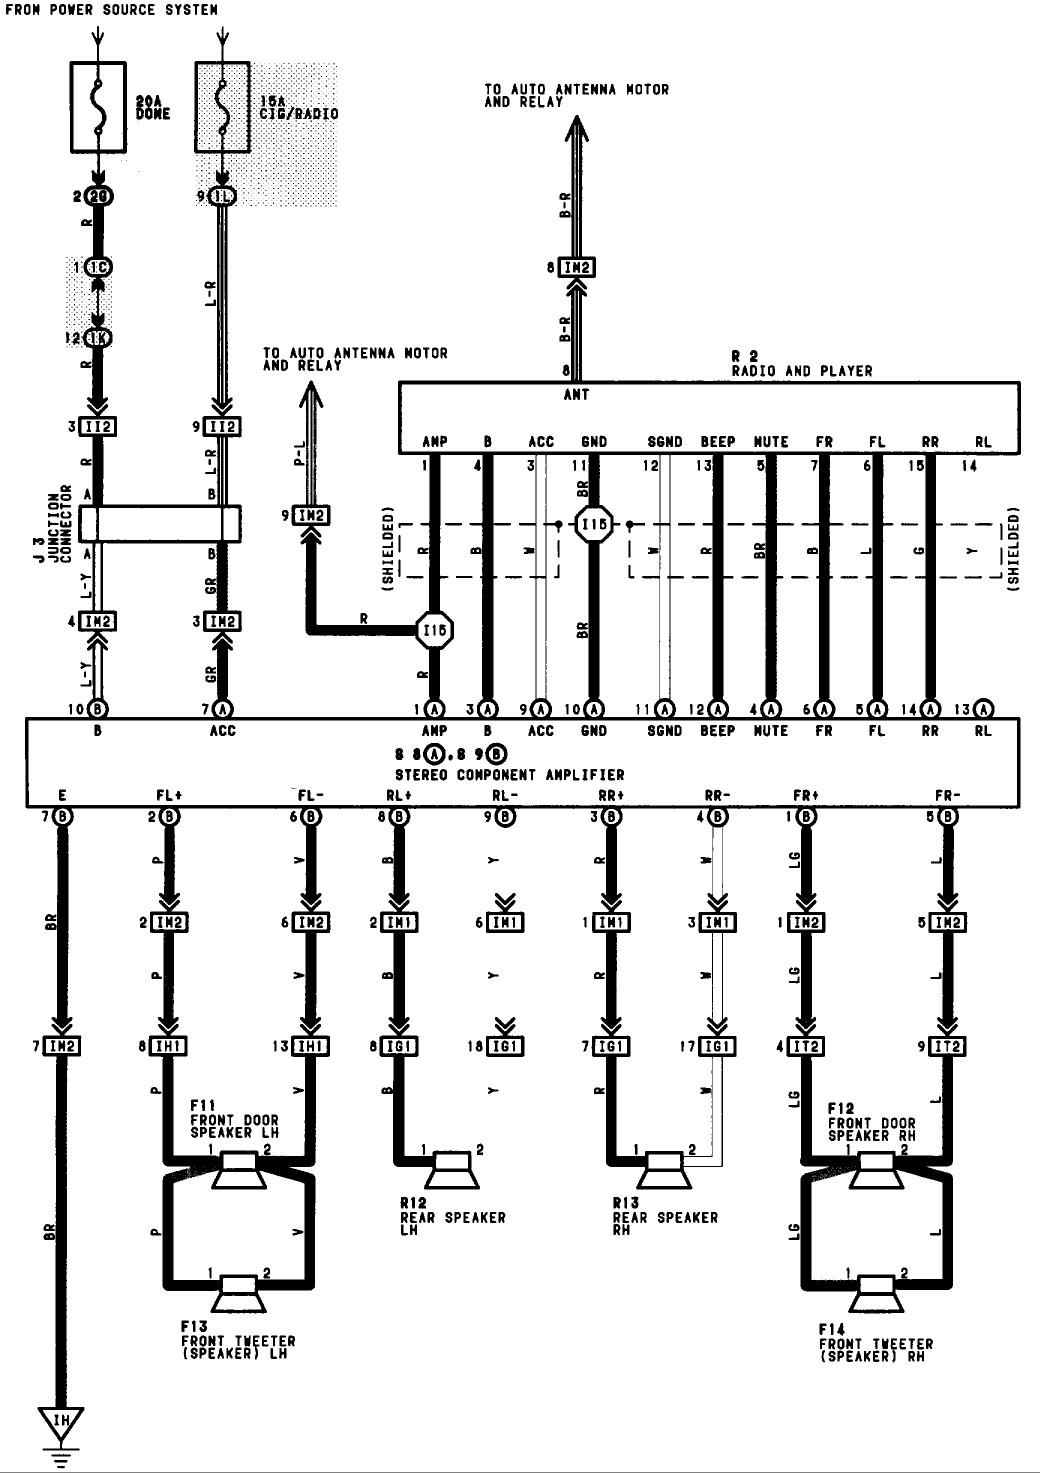 Toyota Avalon Stereo Wiring Diagram